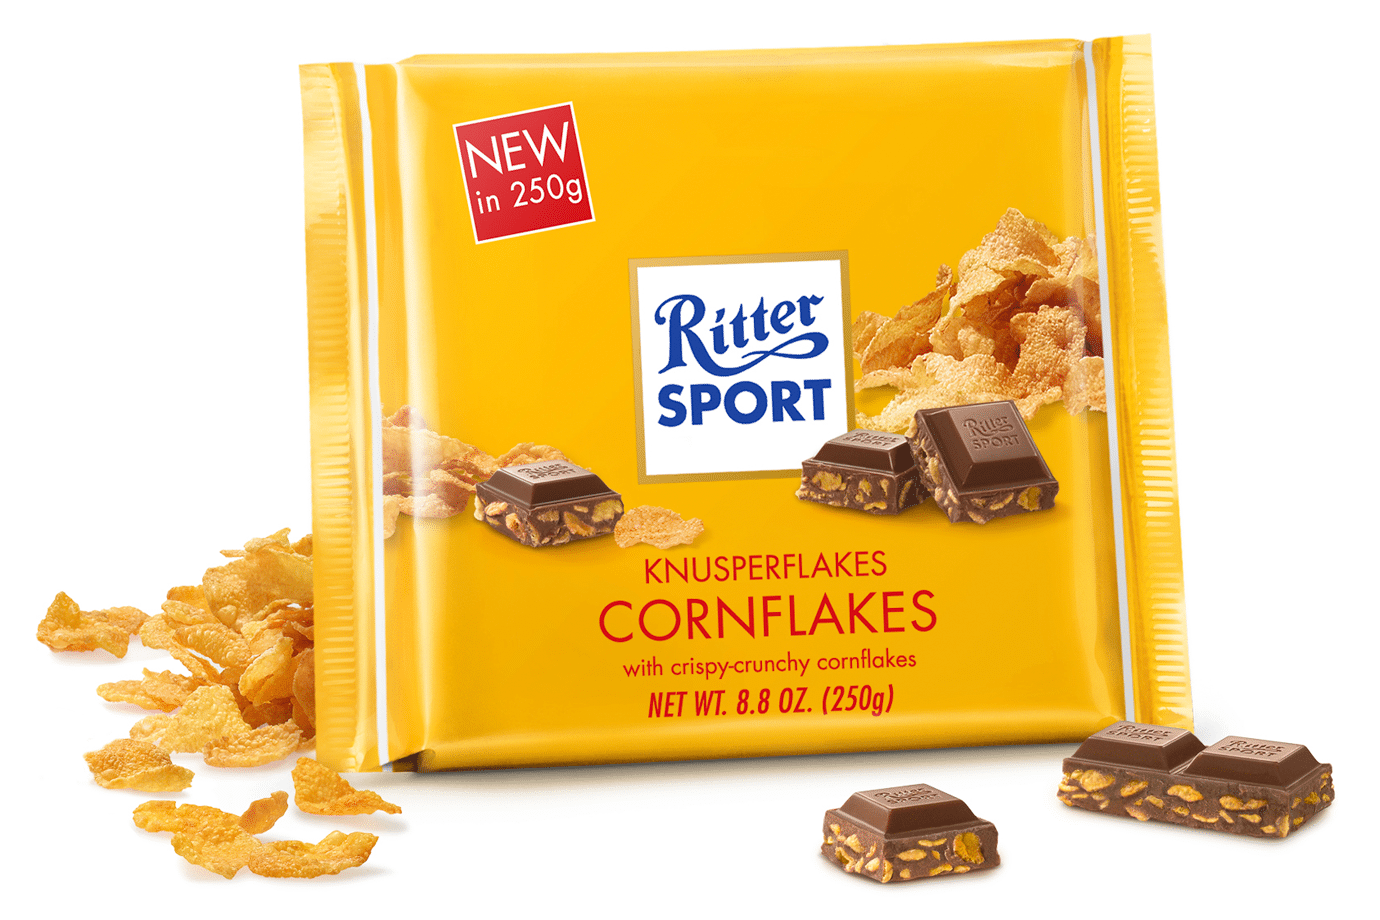 Шоколад ritter sport Knusperflakes